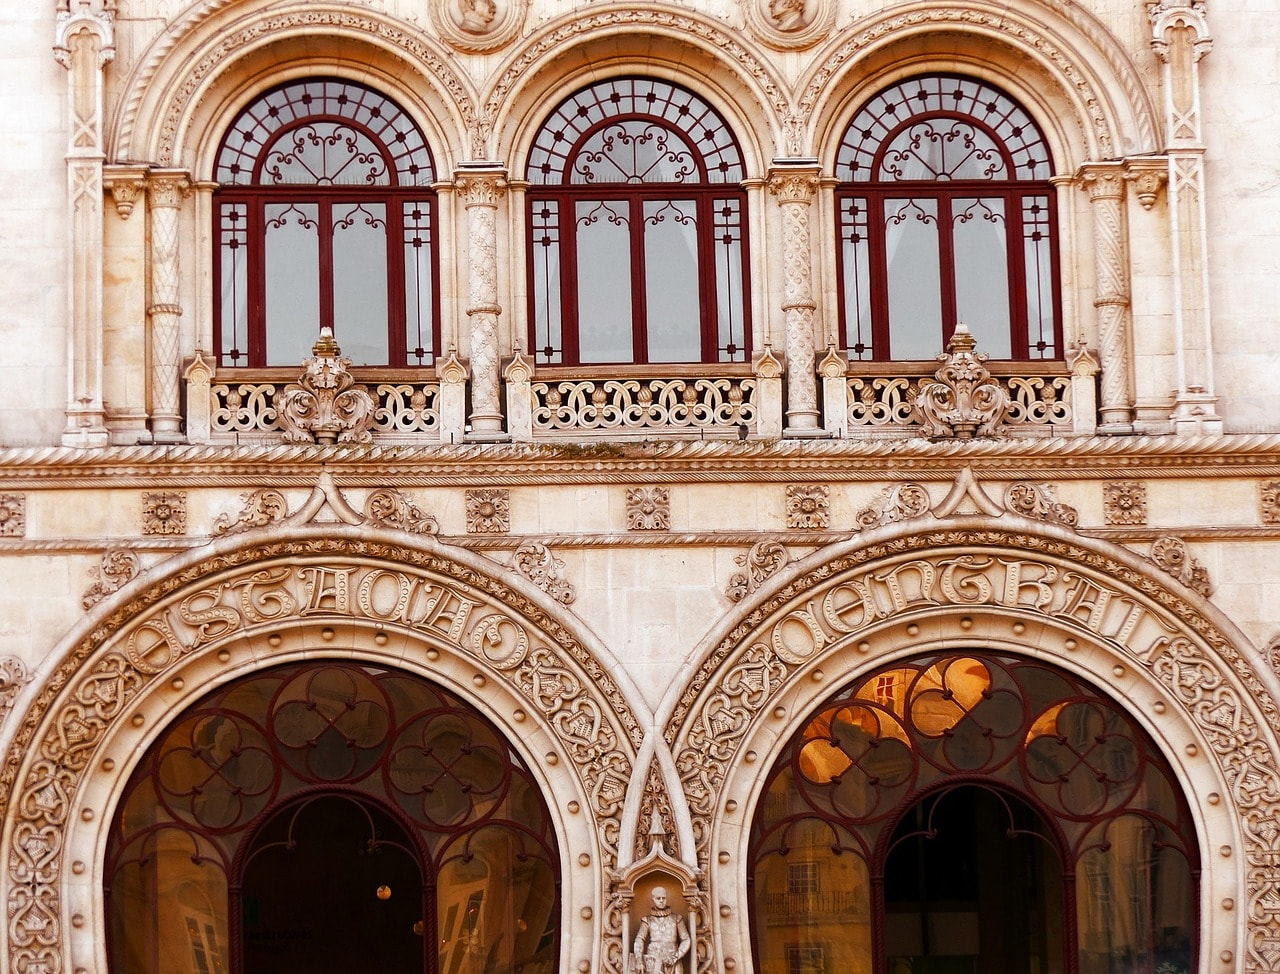 https://pixabay.com/en/station-rossio-lisbon-facade-1101442/